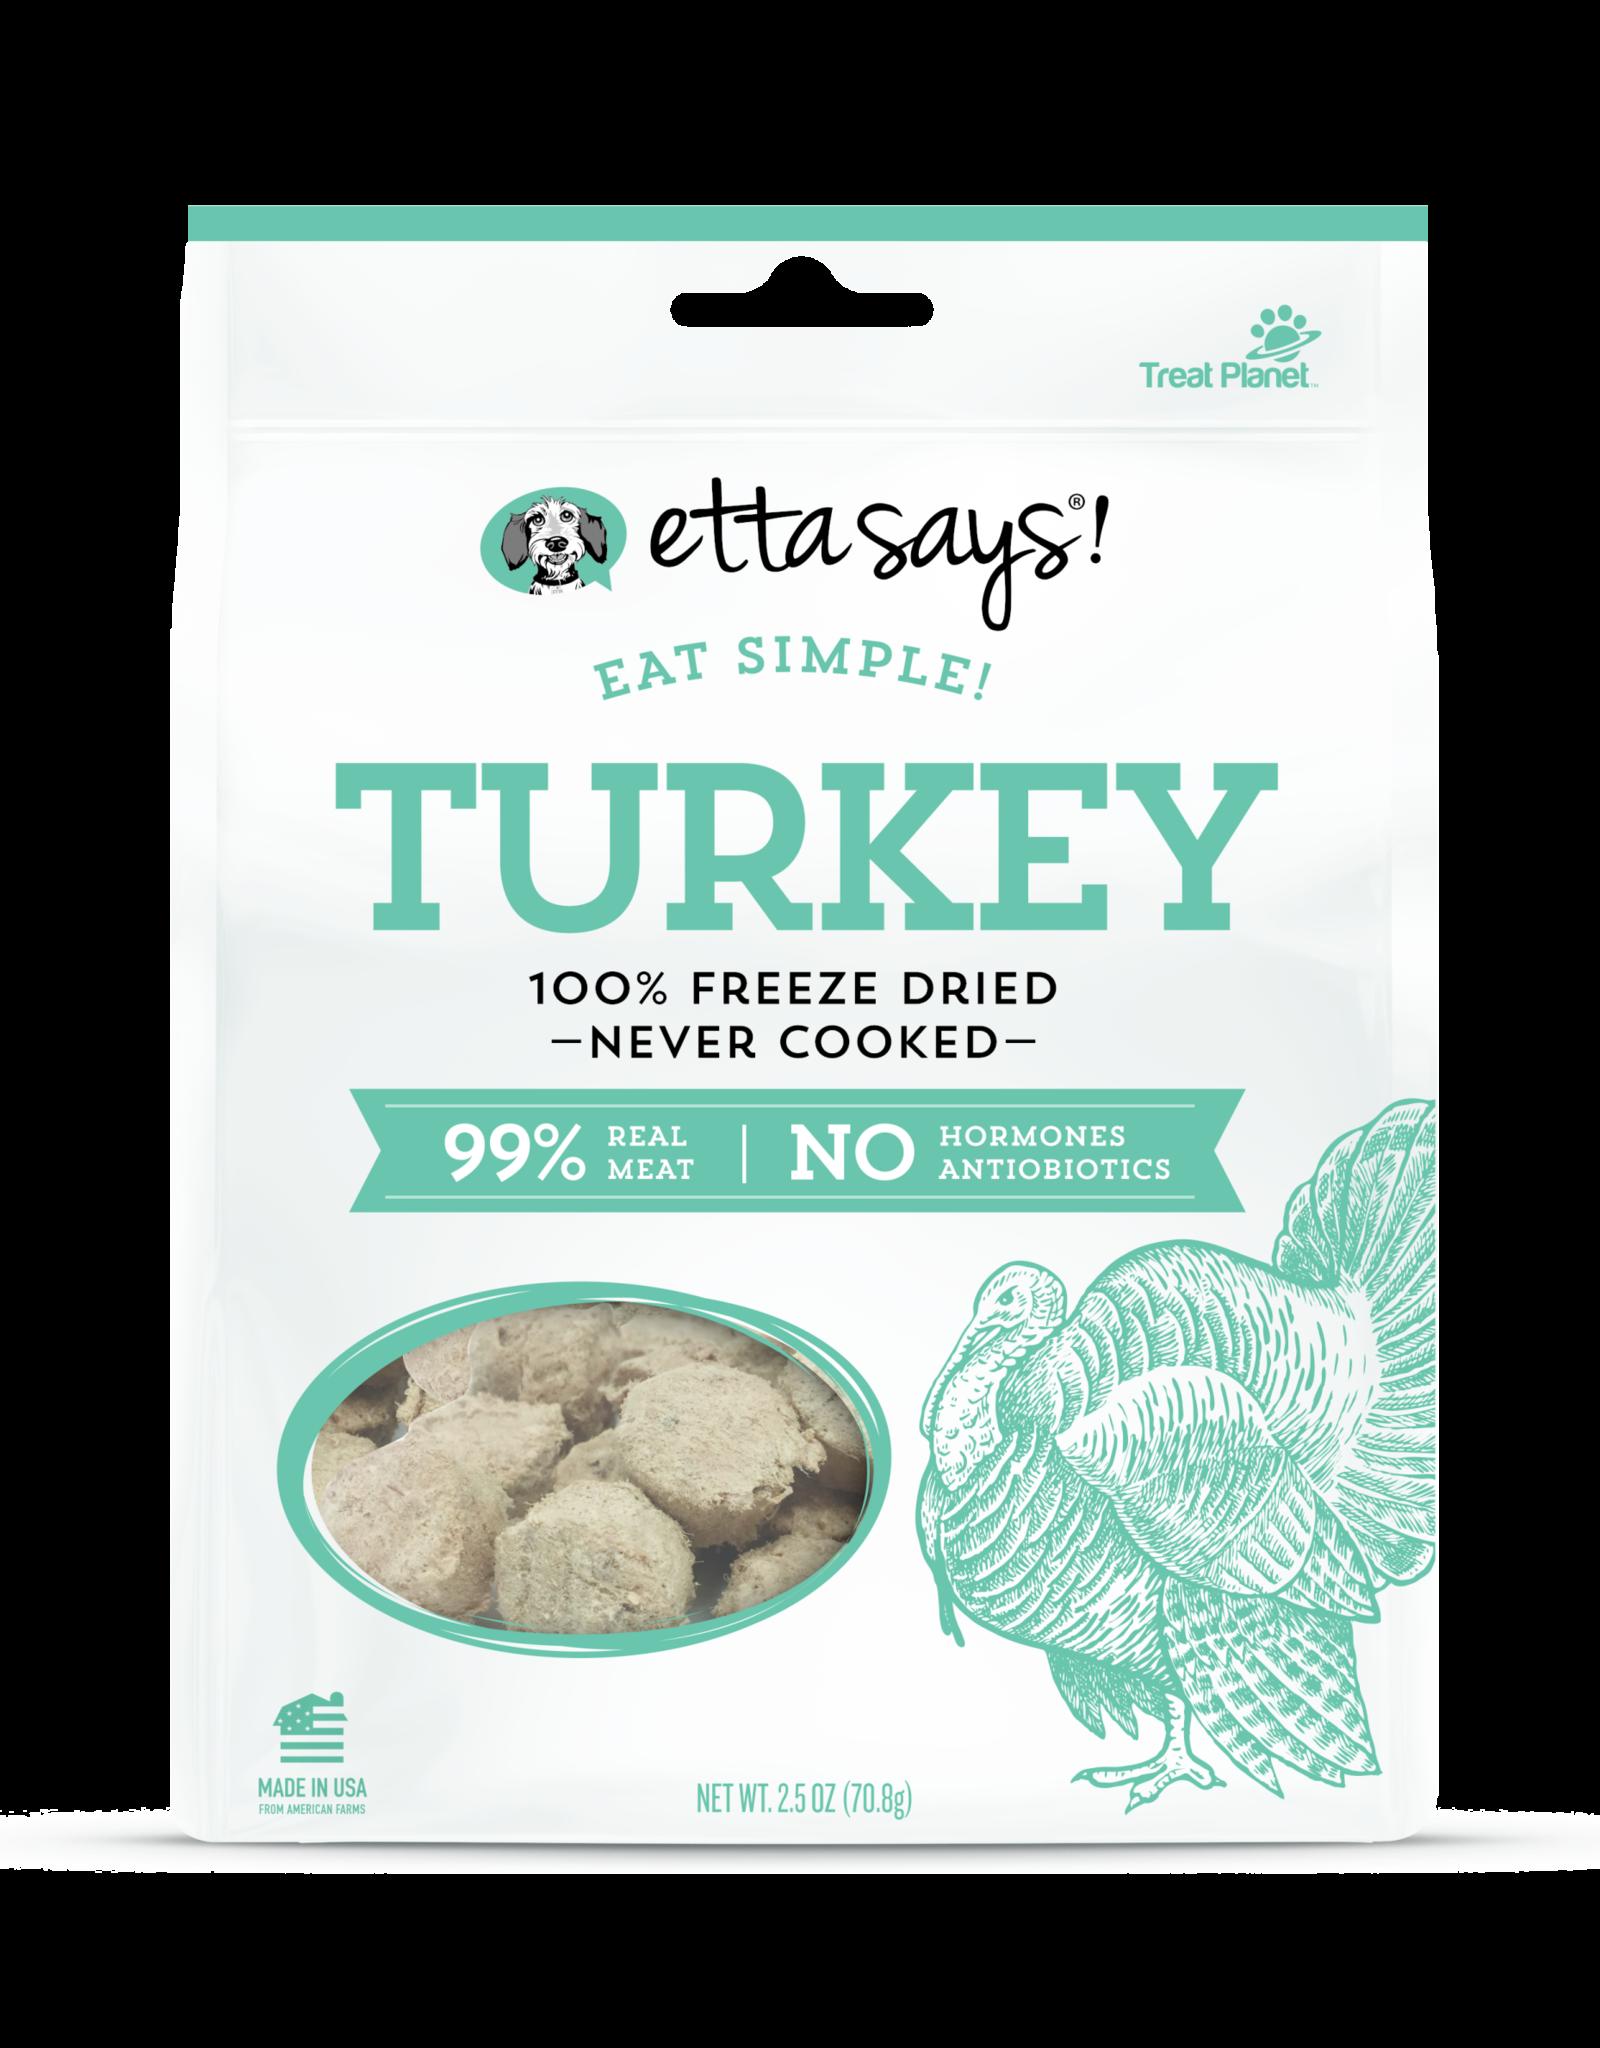 Etta Says Etta Says! Eat Simple! Freeze Dried: Turkey, 2.5 oz